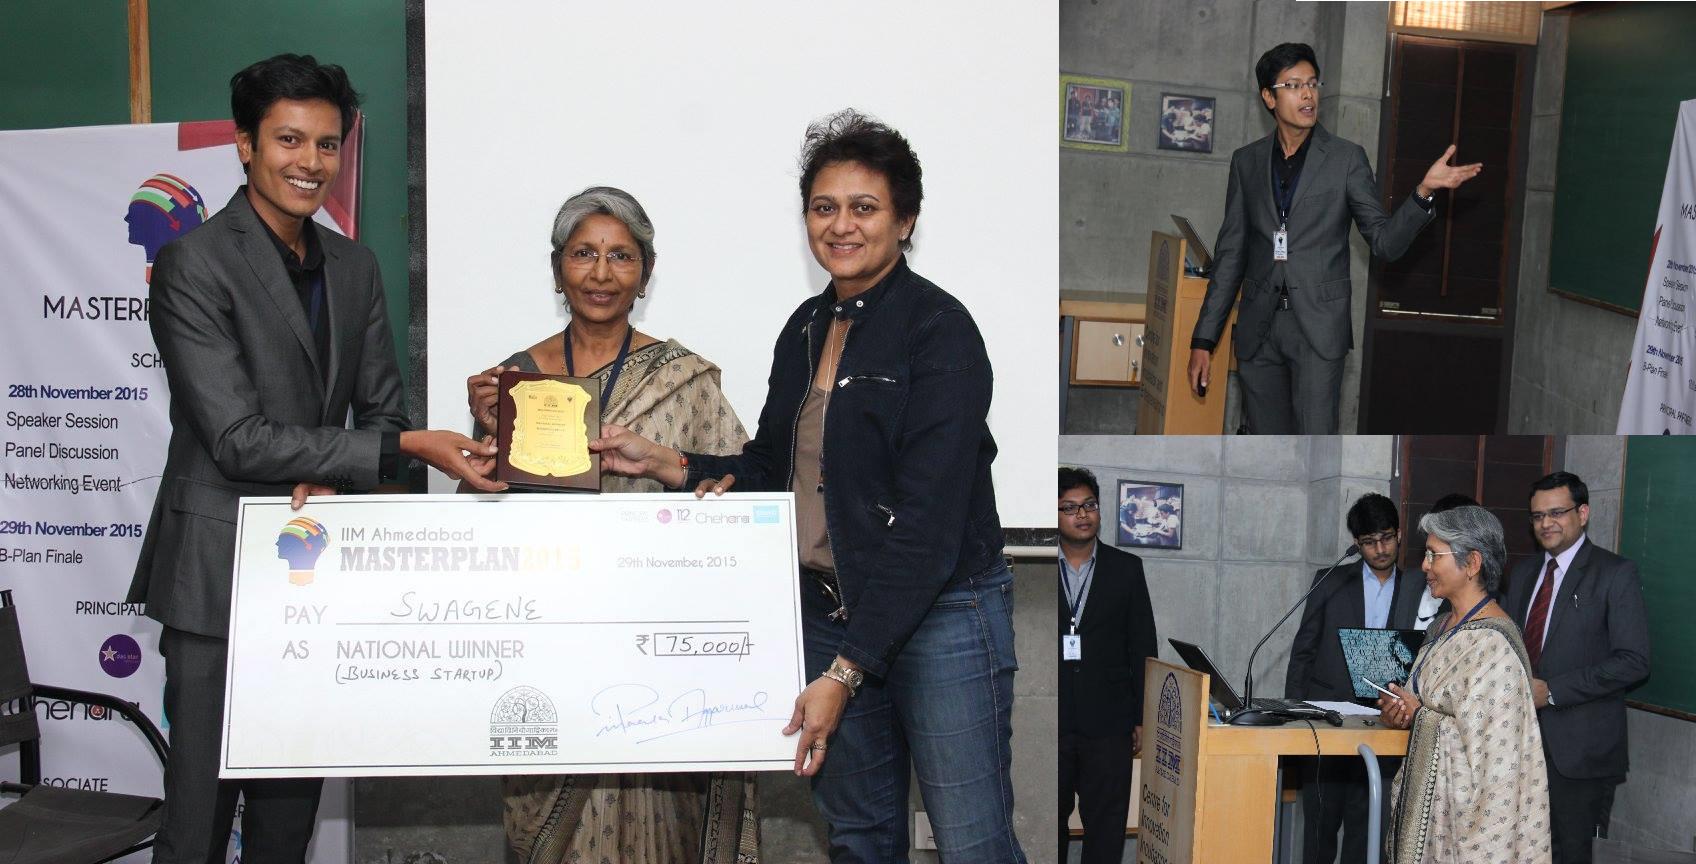 Swagene wins IIM Ahmedabad Masterplan 2015